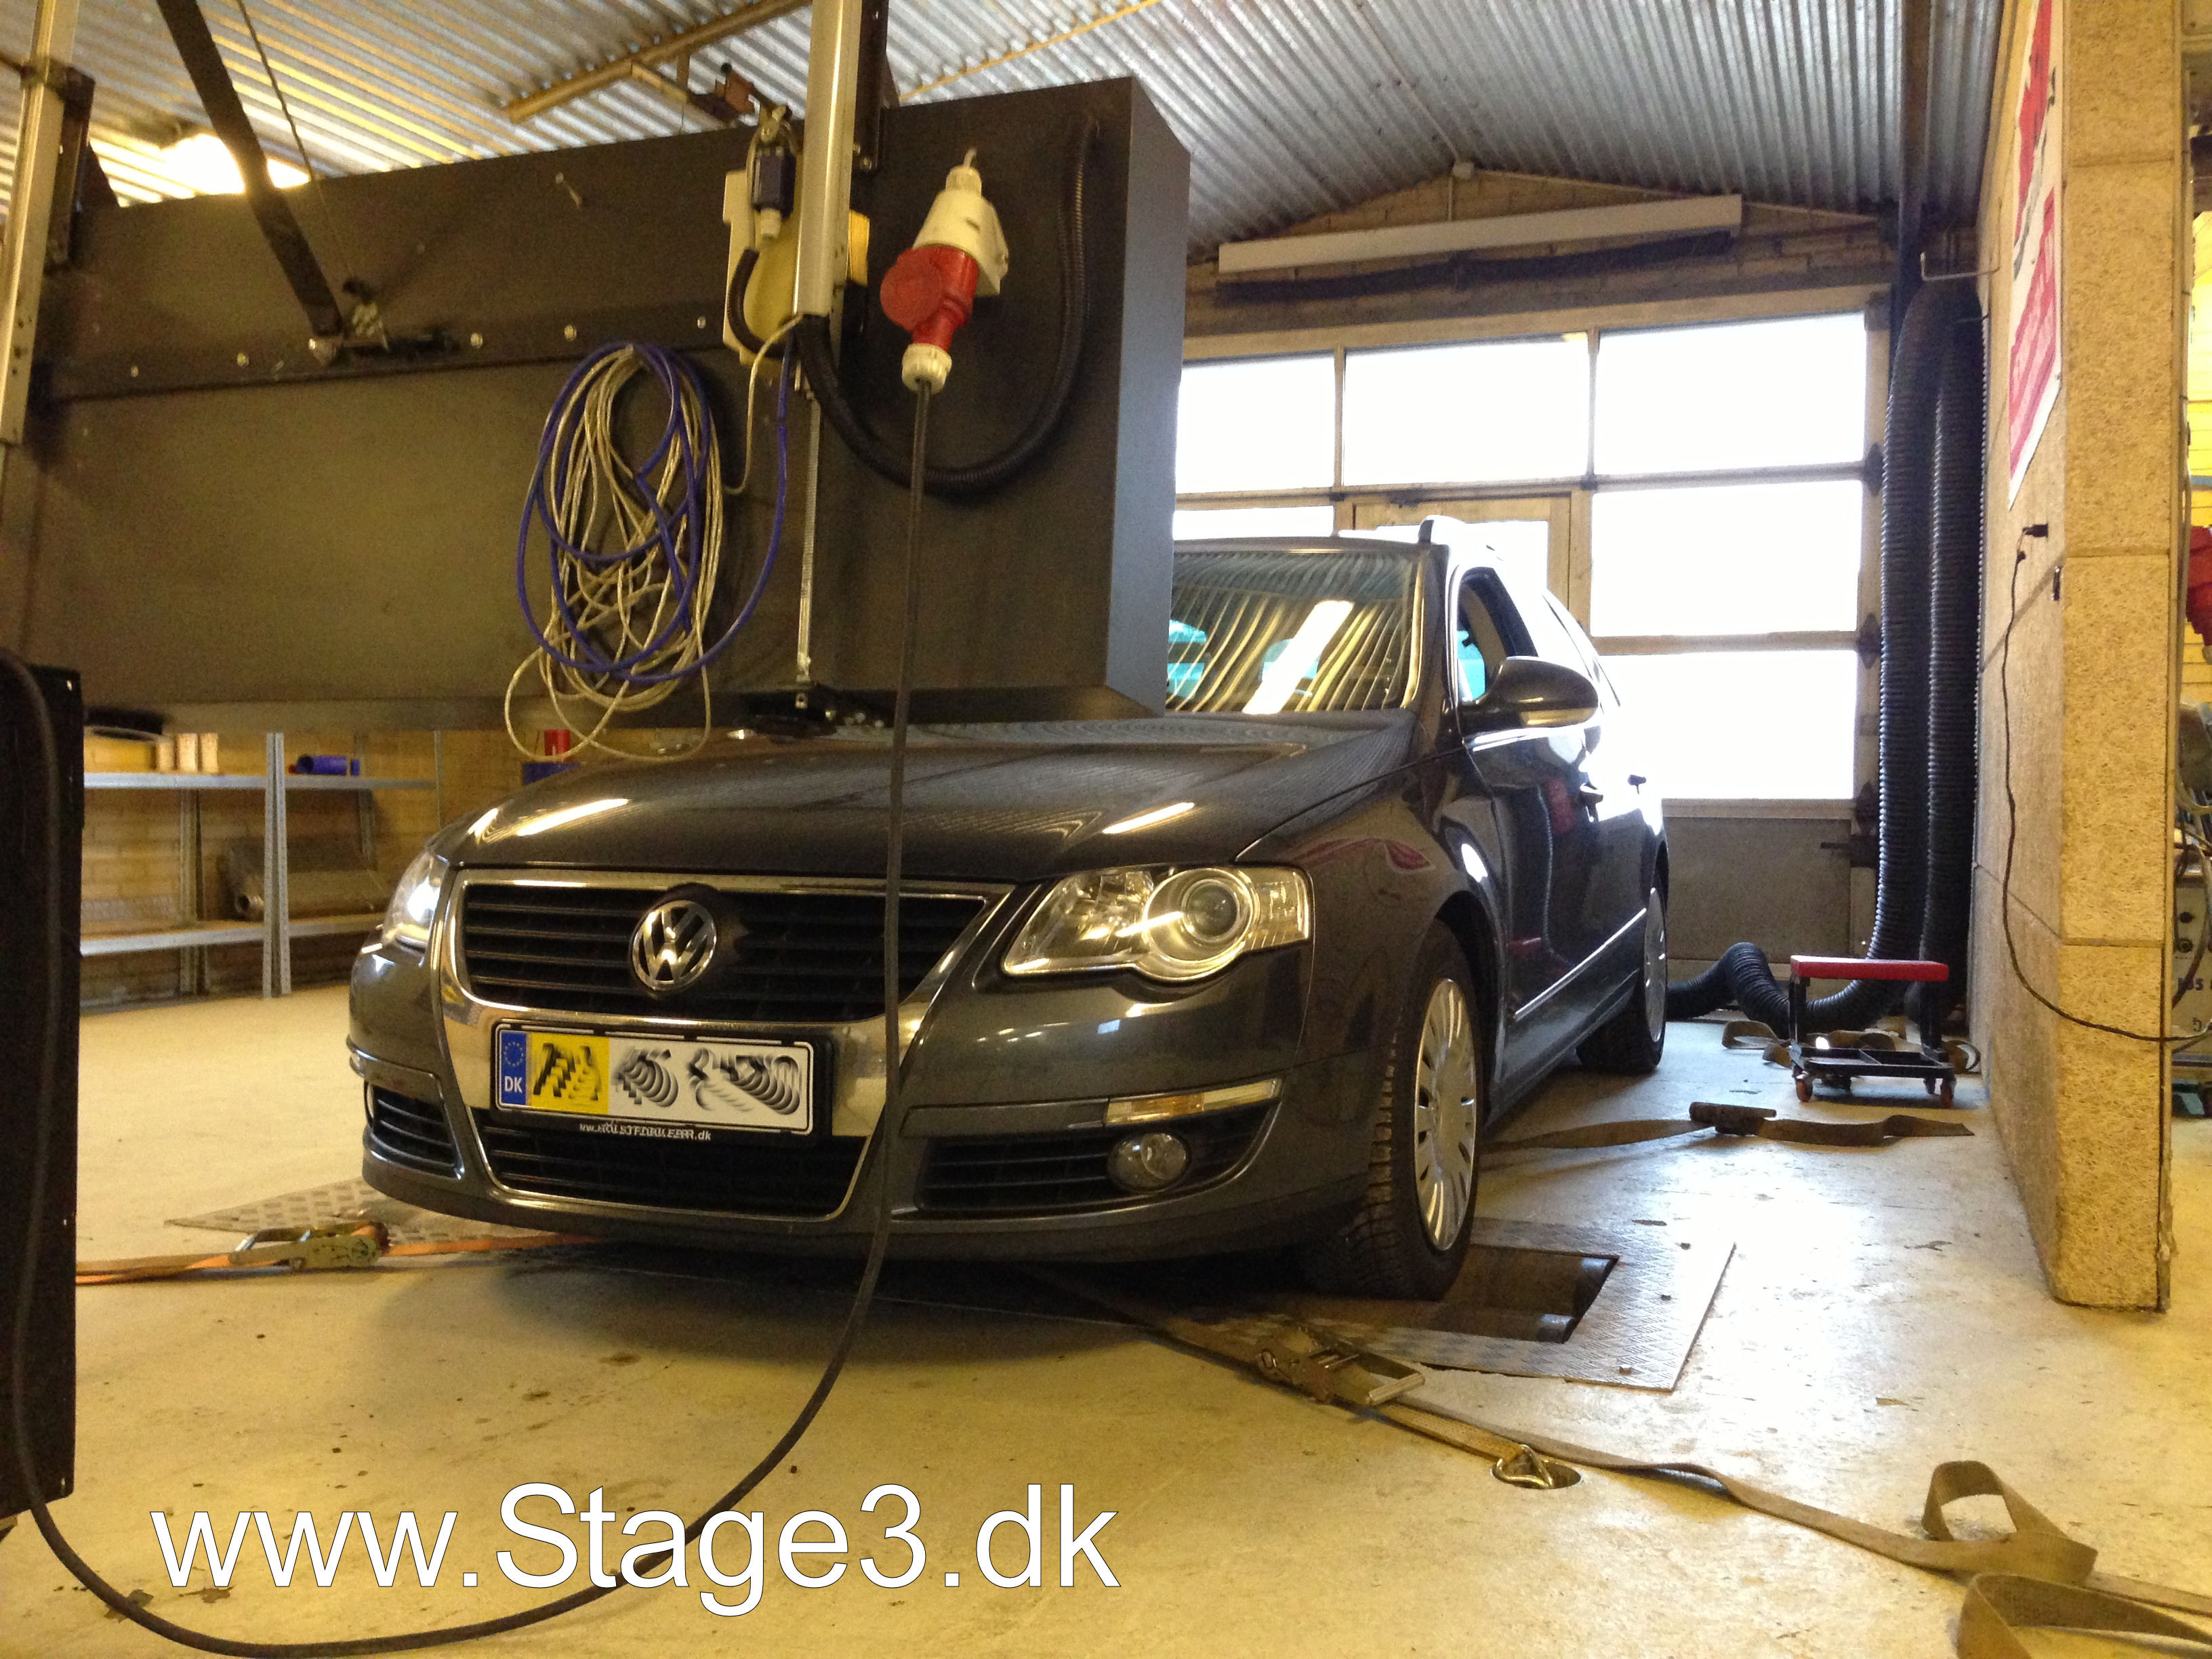 VW Passat 140 HK 2010 chiptuning (5)